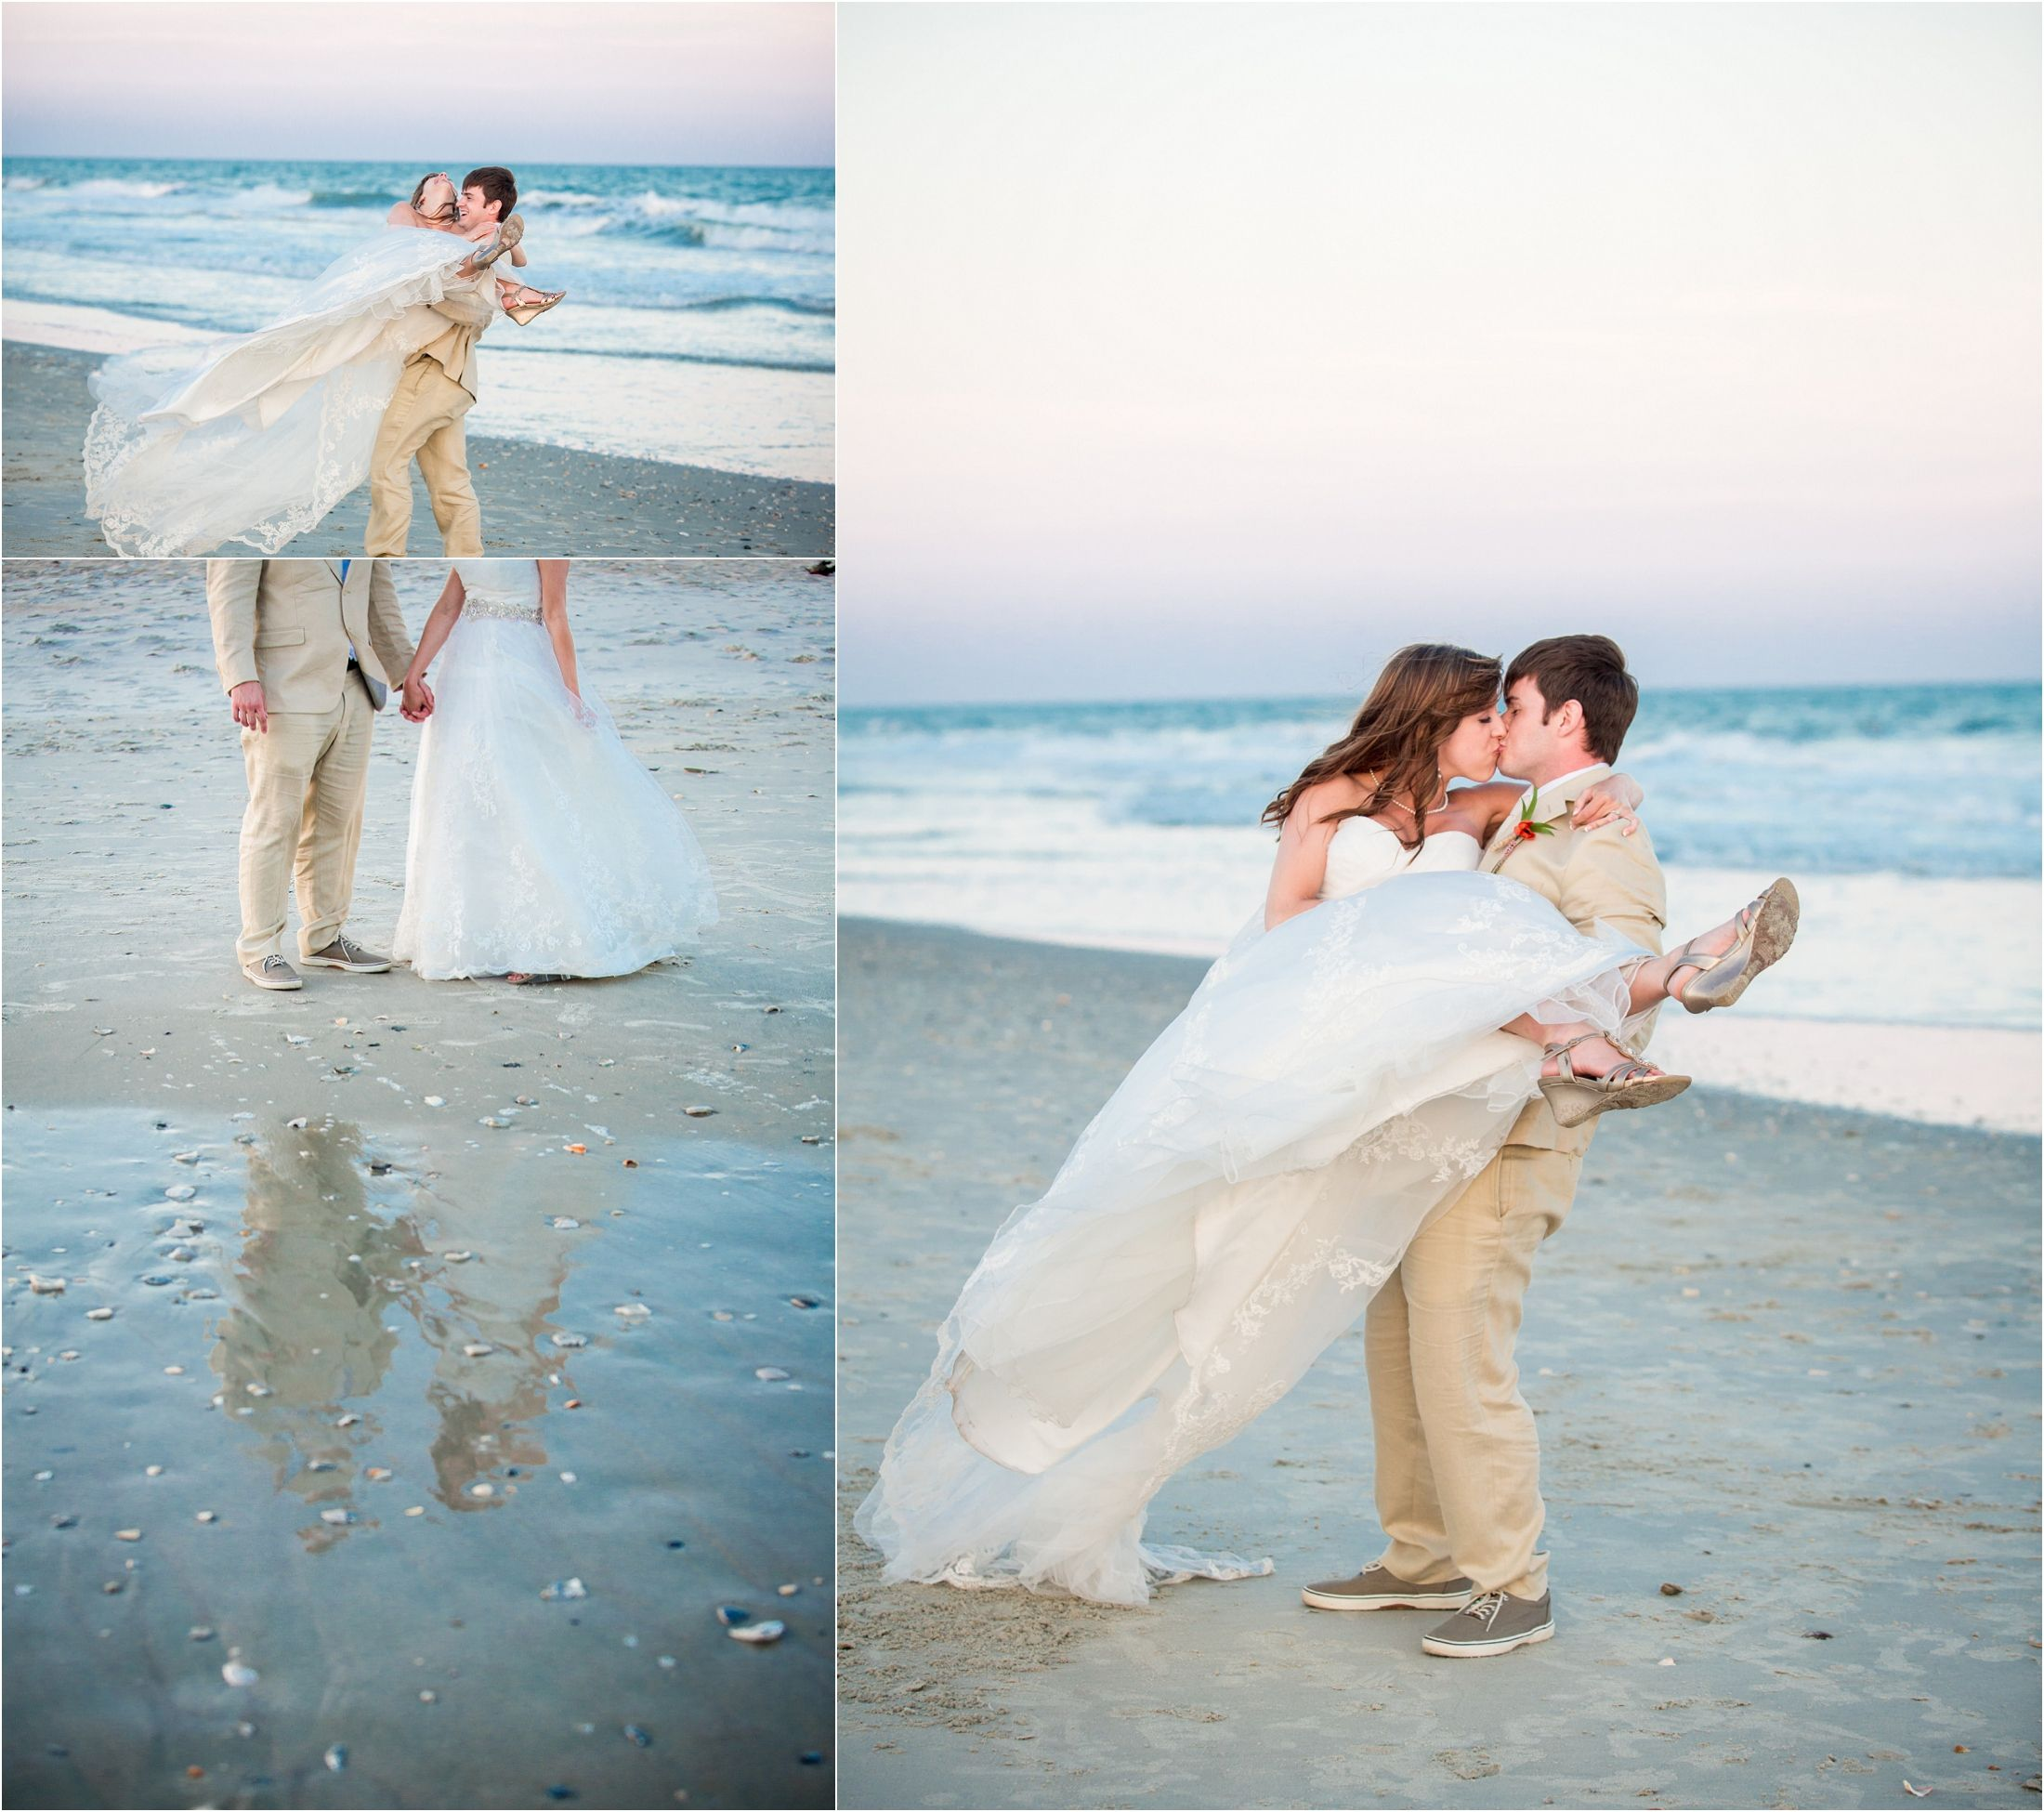 beach portraits wedding portraits romantic couple poses